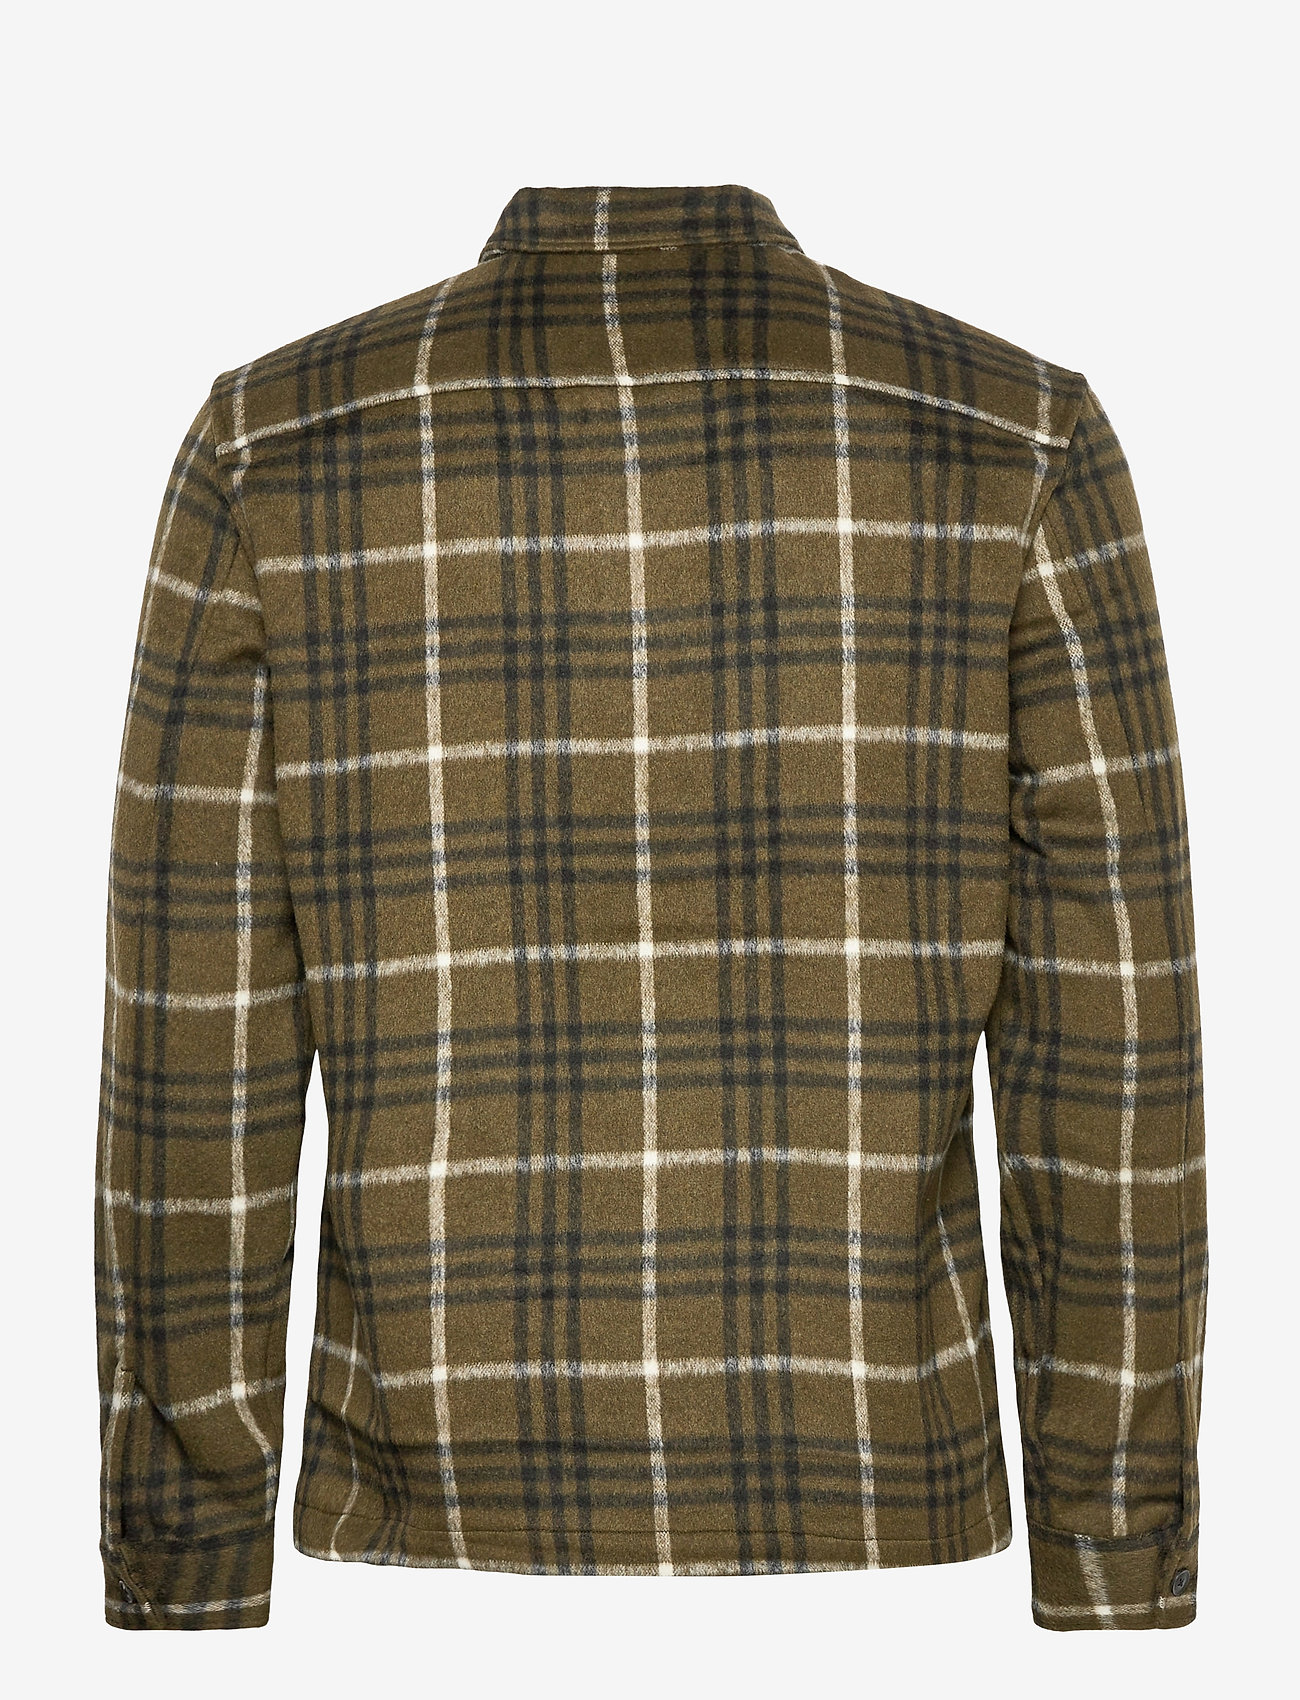 AllSaints - BERTHOLD LS SHIRT - chemises de lin - birch green/jt blk - 1